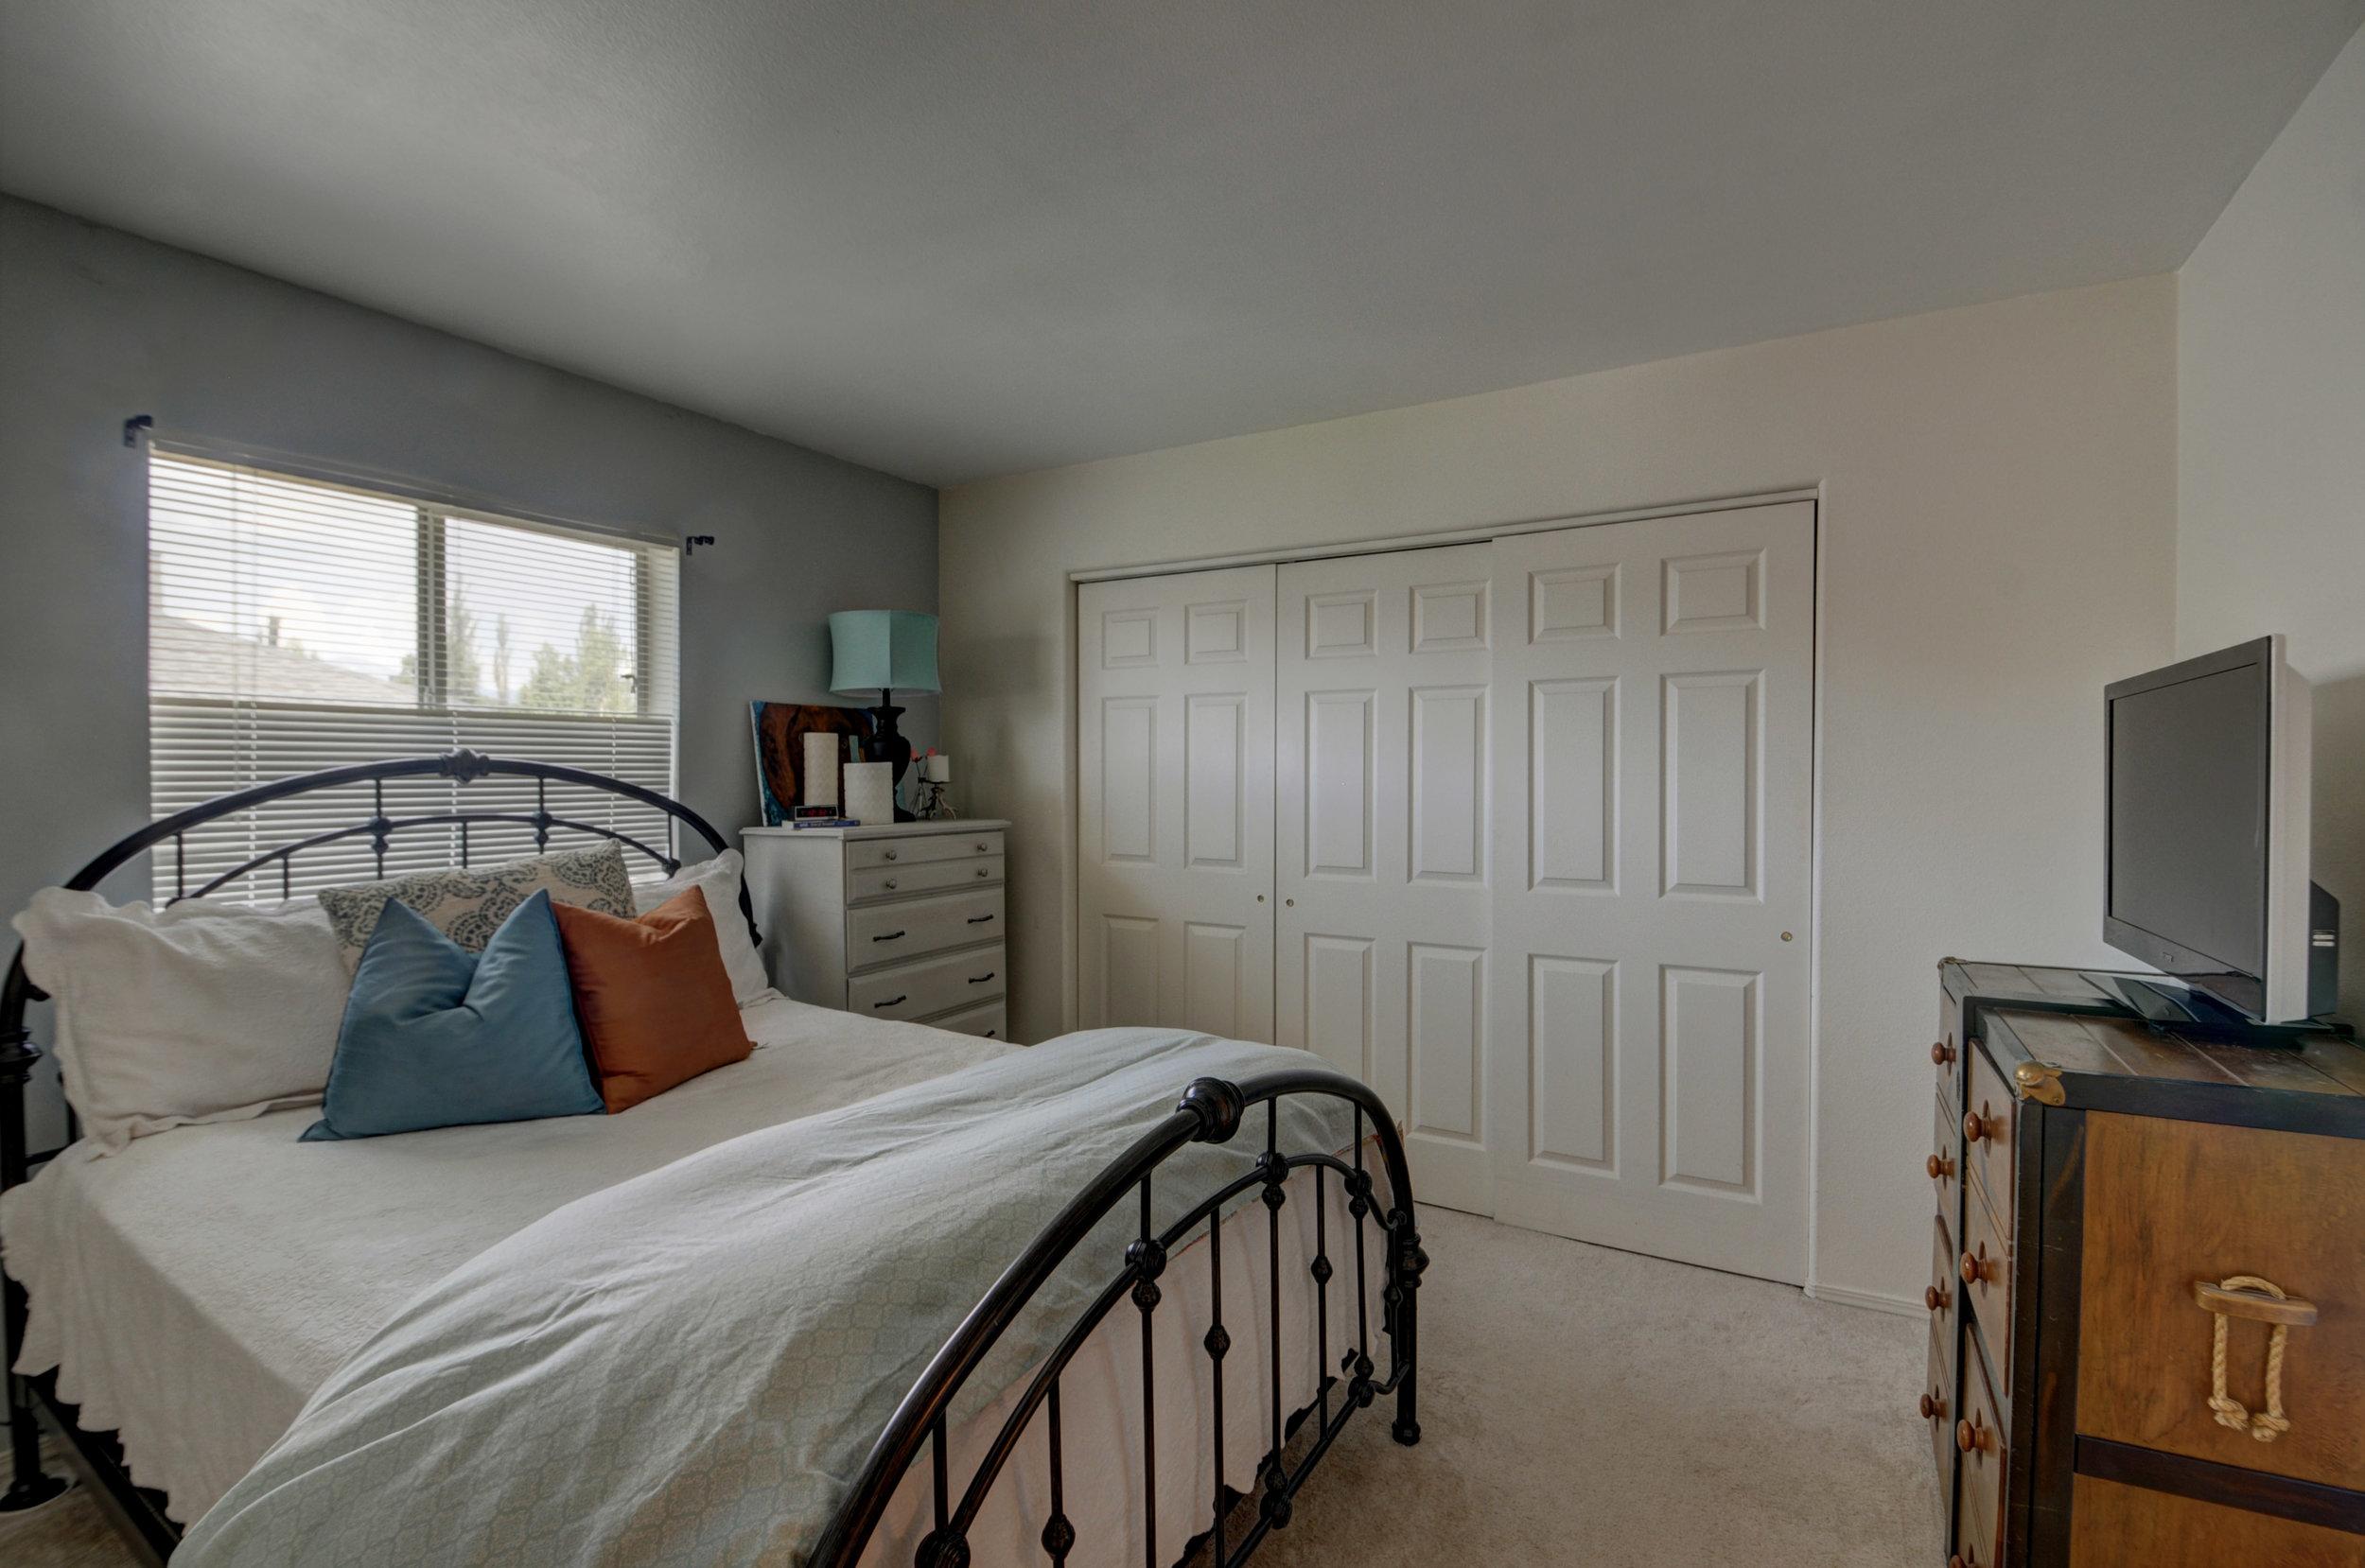 bedroom4159.jpg